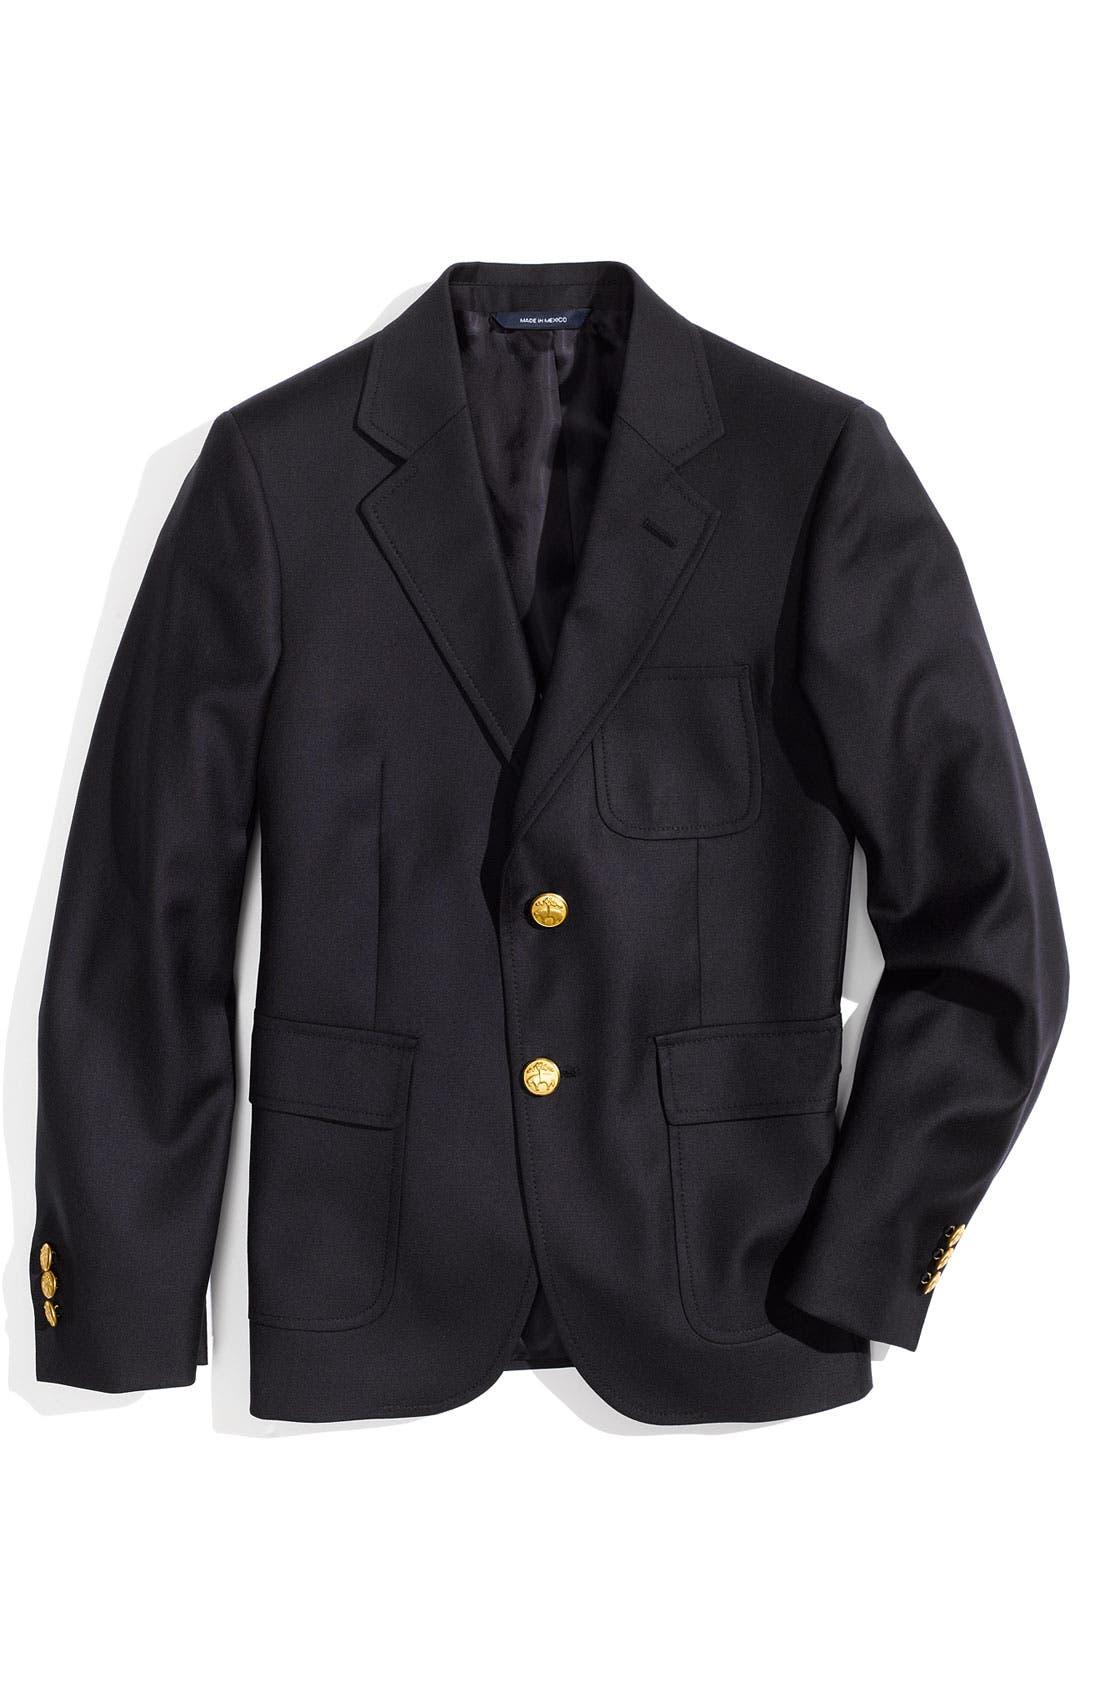 Alternate Image 1 Selected - Brooks Brothers Wool Blazer (Big Boys)